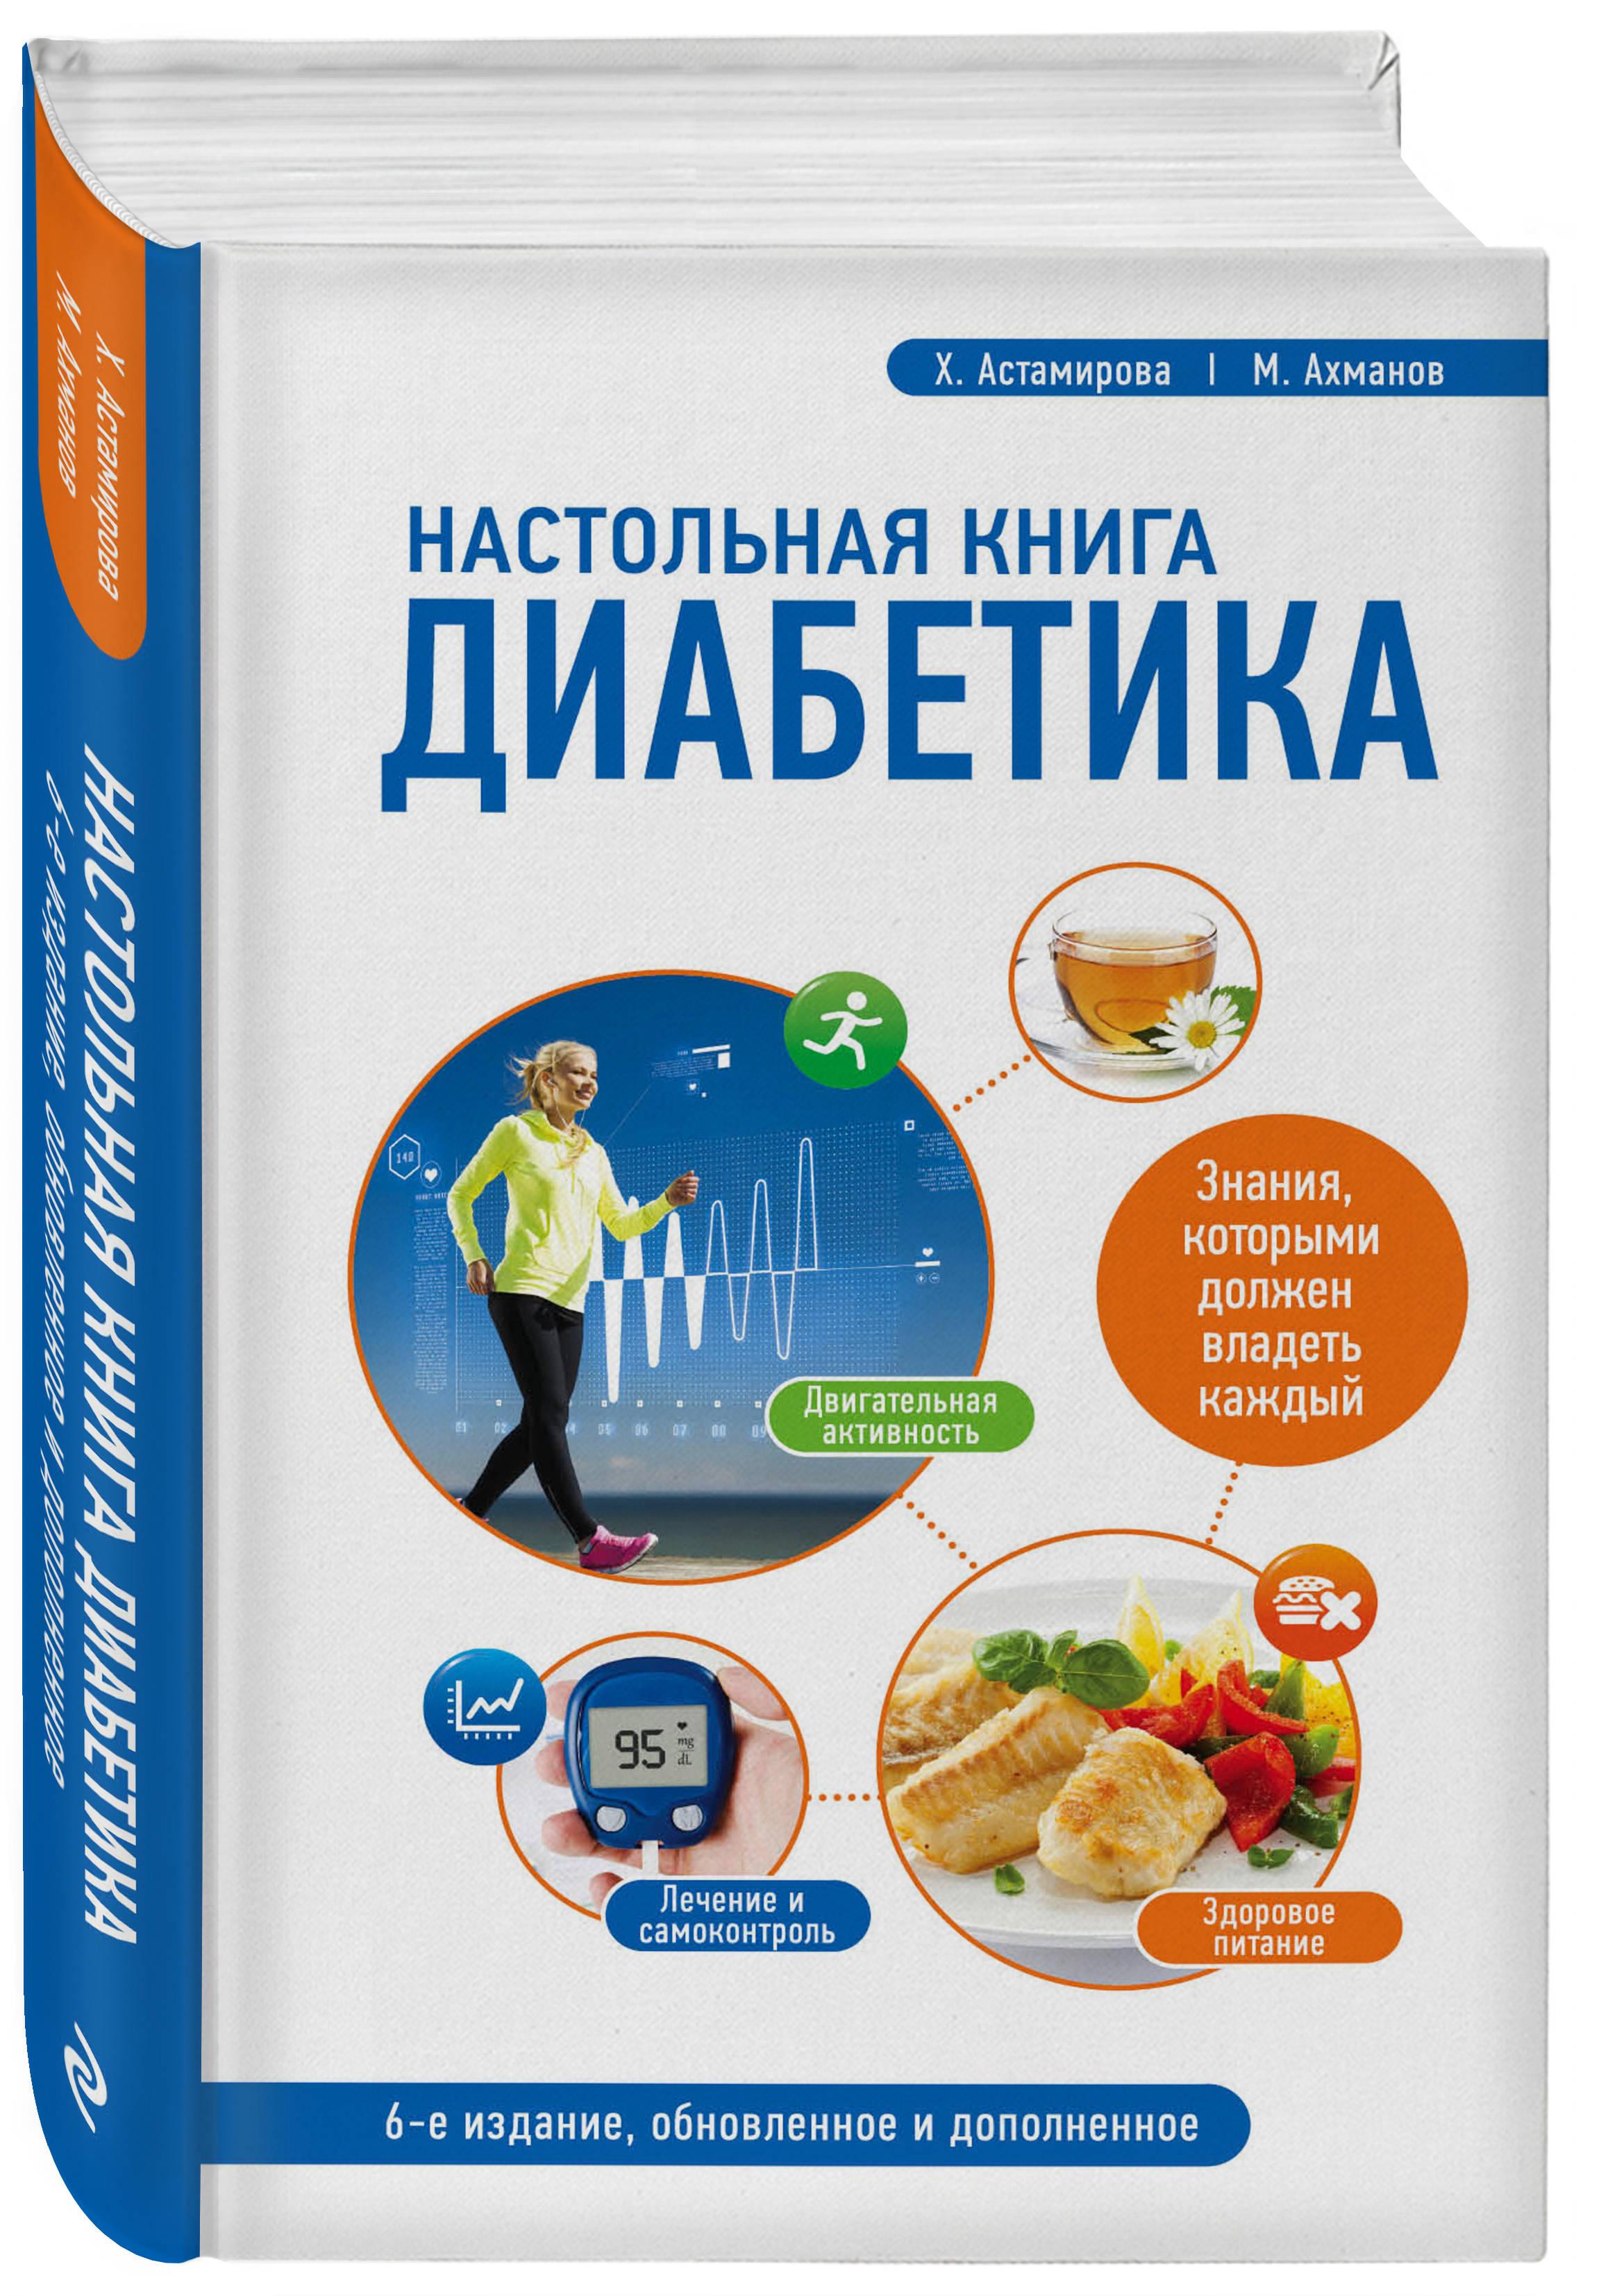 Настольная книга диабетика: 6-е издание ( Астамирова Х.С., Ахманов М.С.  )